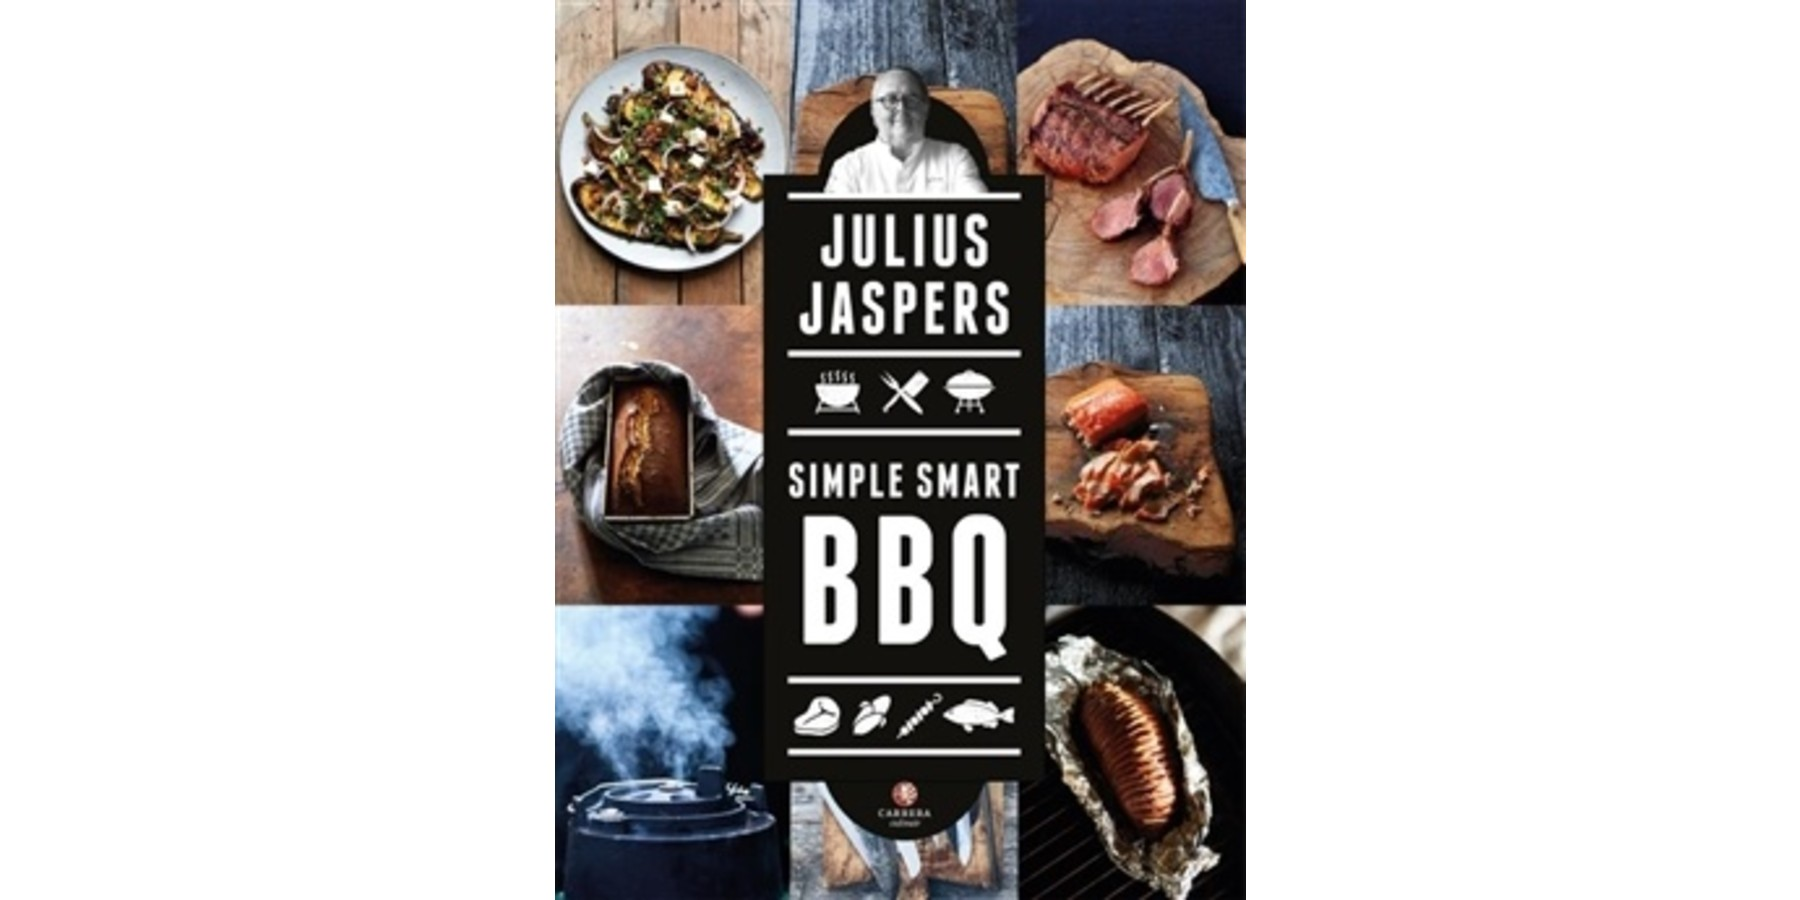 Simple smart BBQ - Julius Jaspers